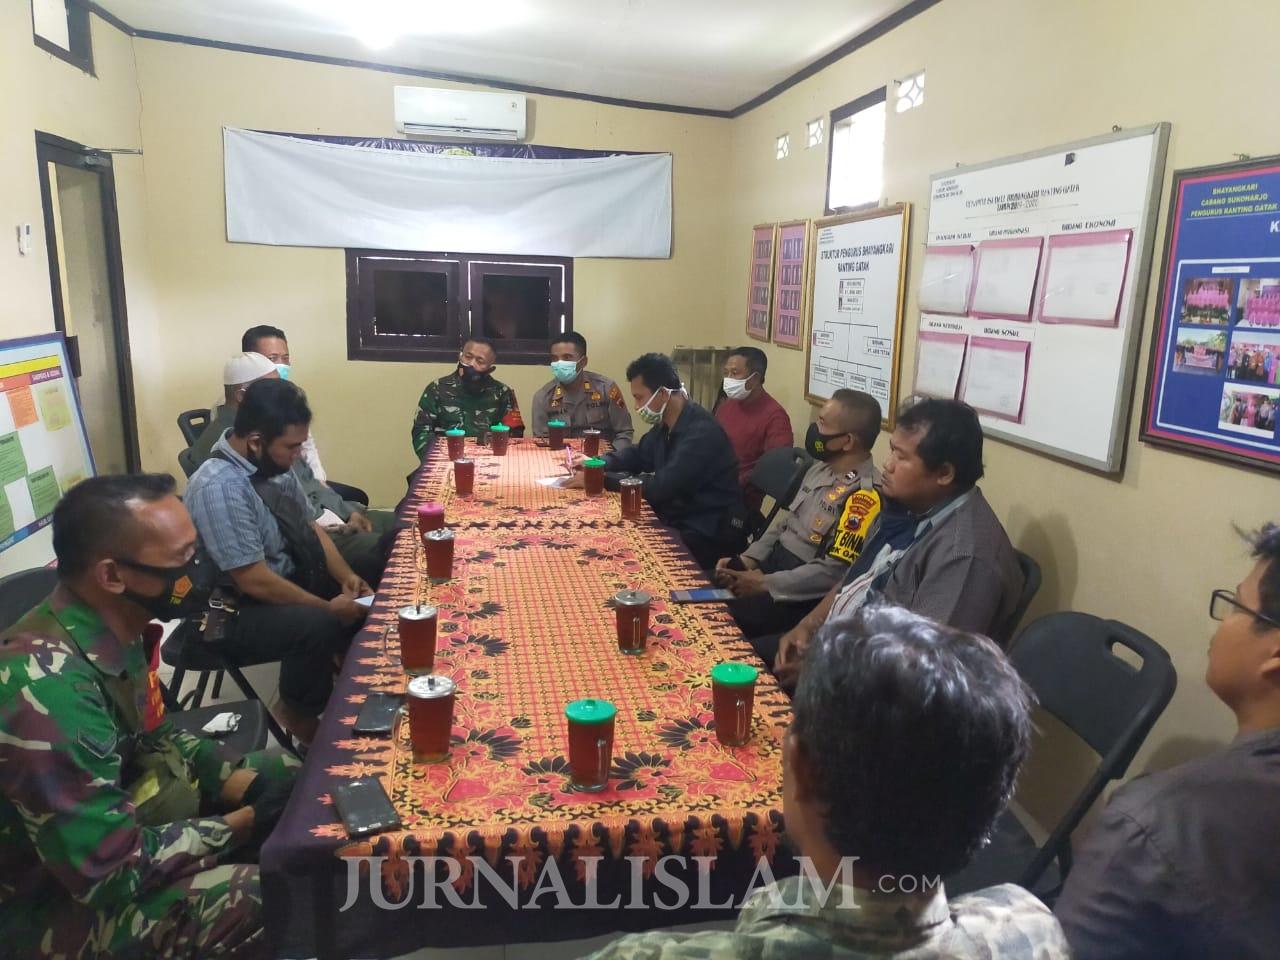 Dugaan Pembangunan Arena Judi Ayam di Blimbing Gatak Sukoharjo Ditolak Warga